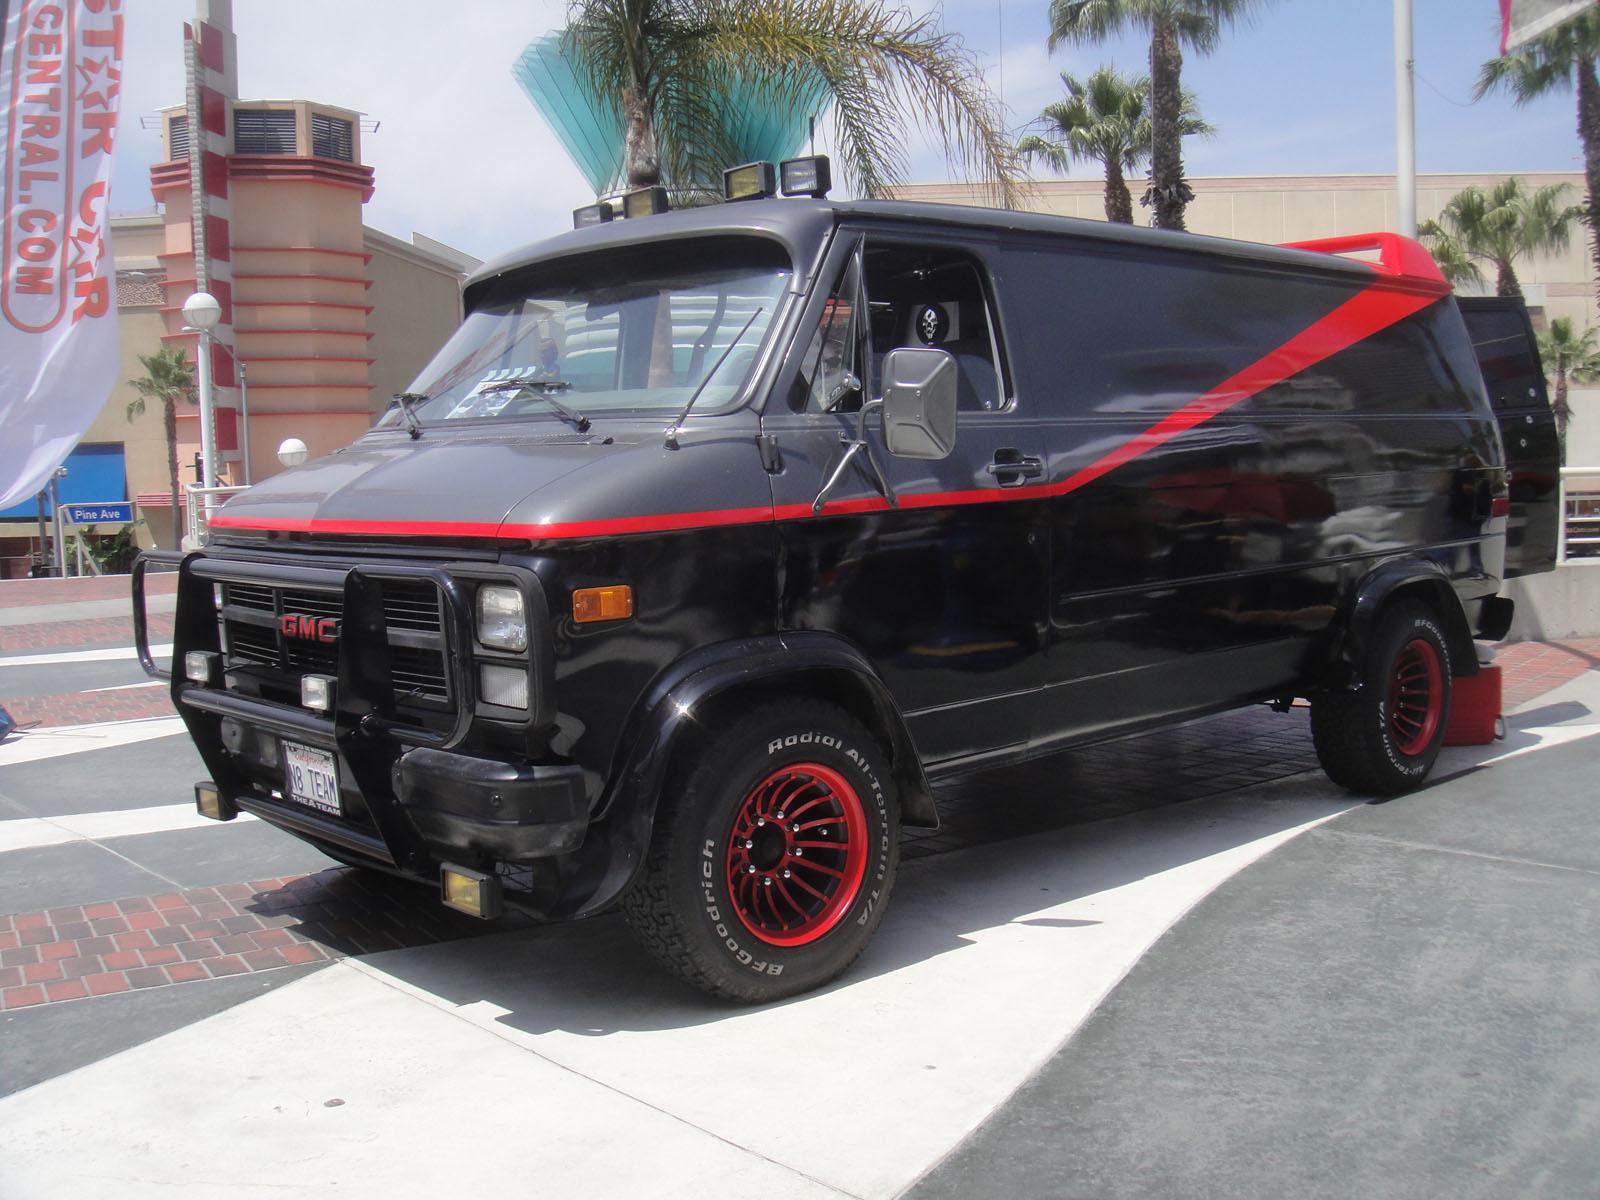 1994 Gmc Conversion Van >> File:Long Beach Comic Expo 2012 - A-Team van (7186650356).jpg - Wikimedia Commons